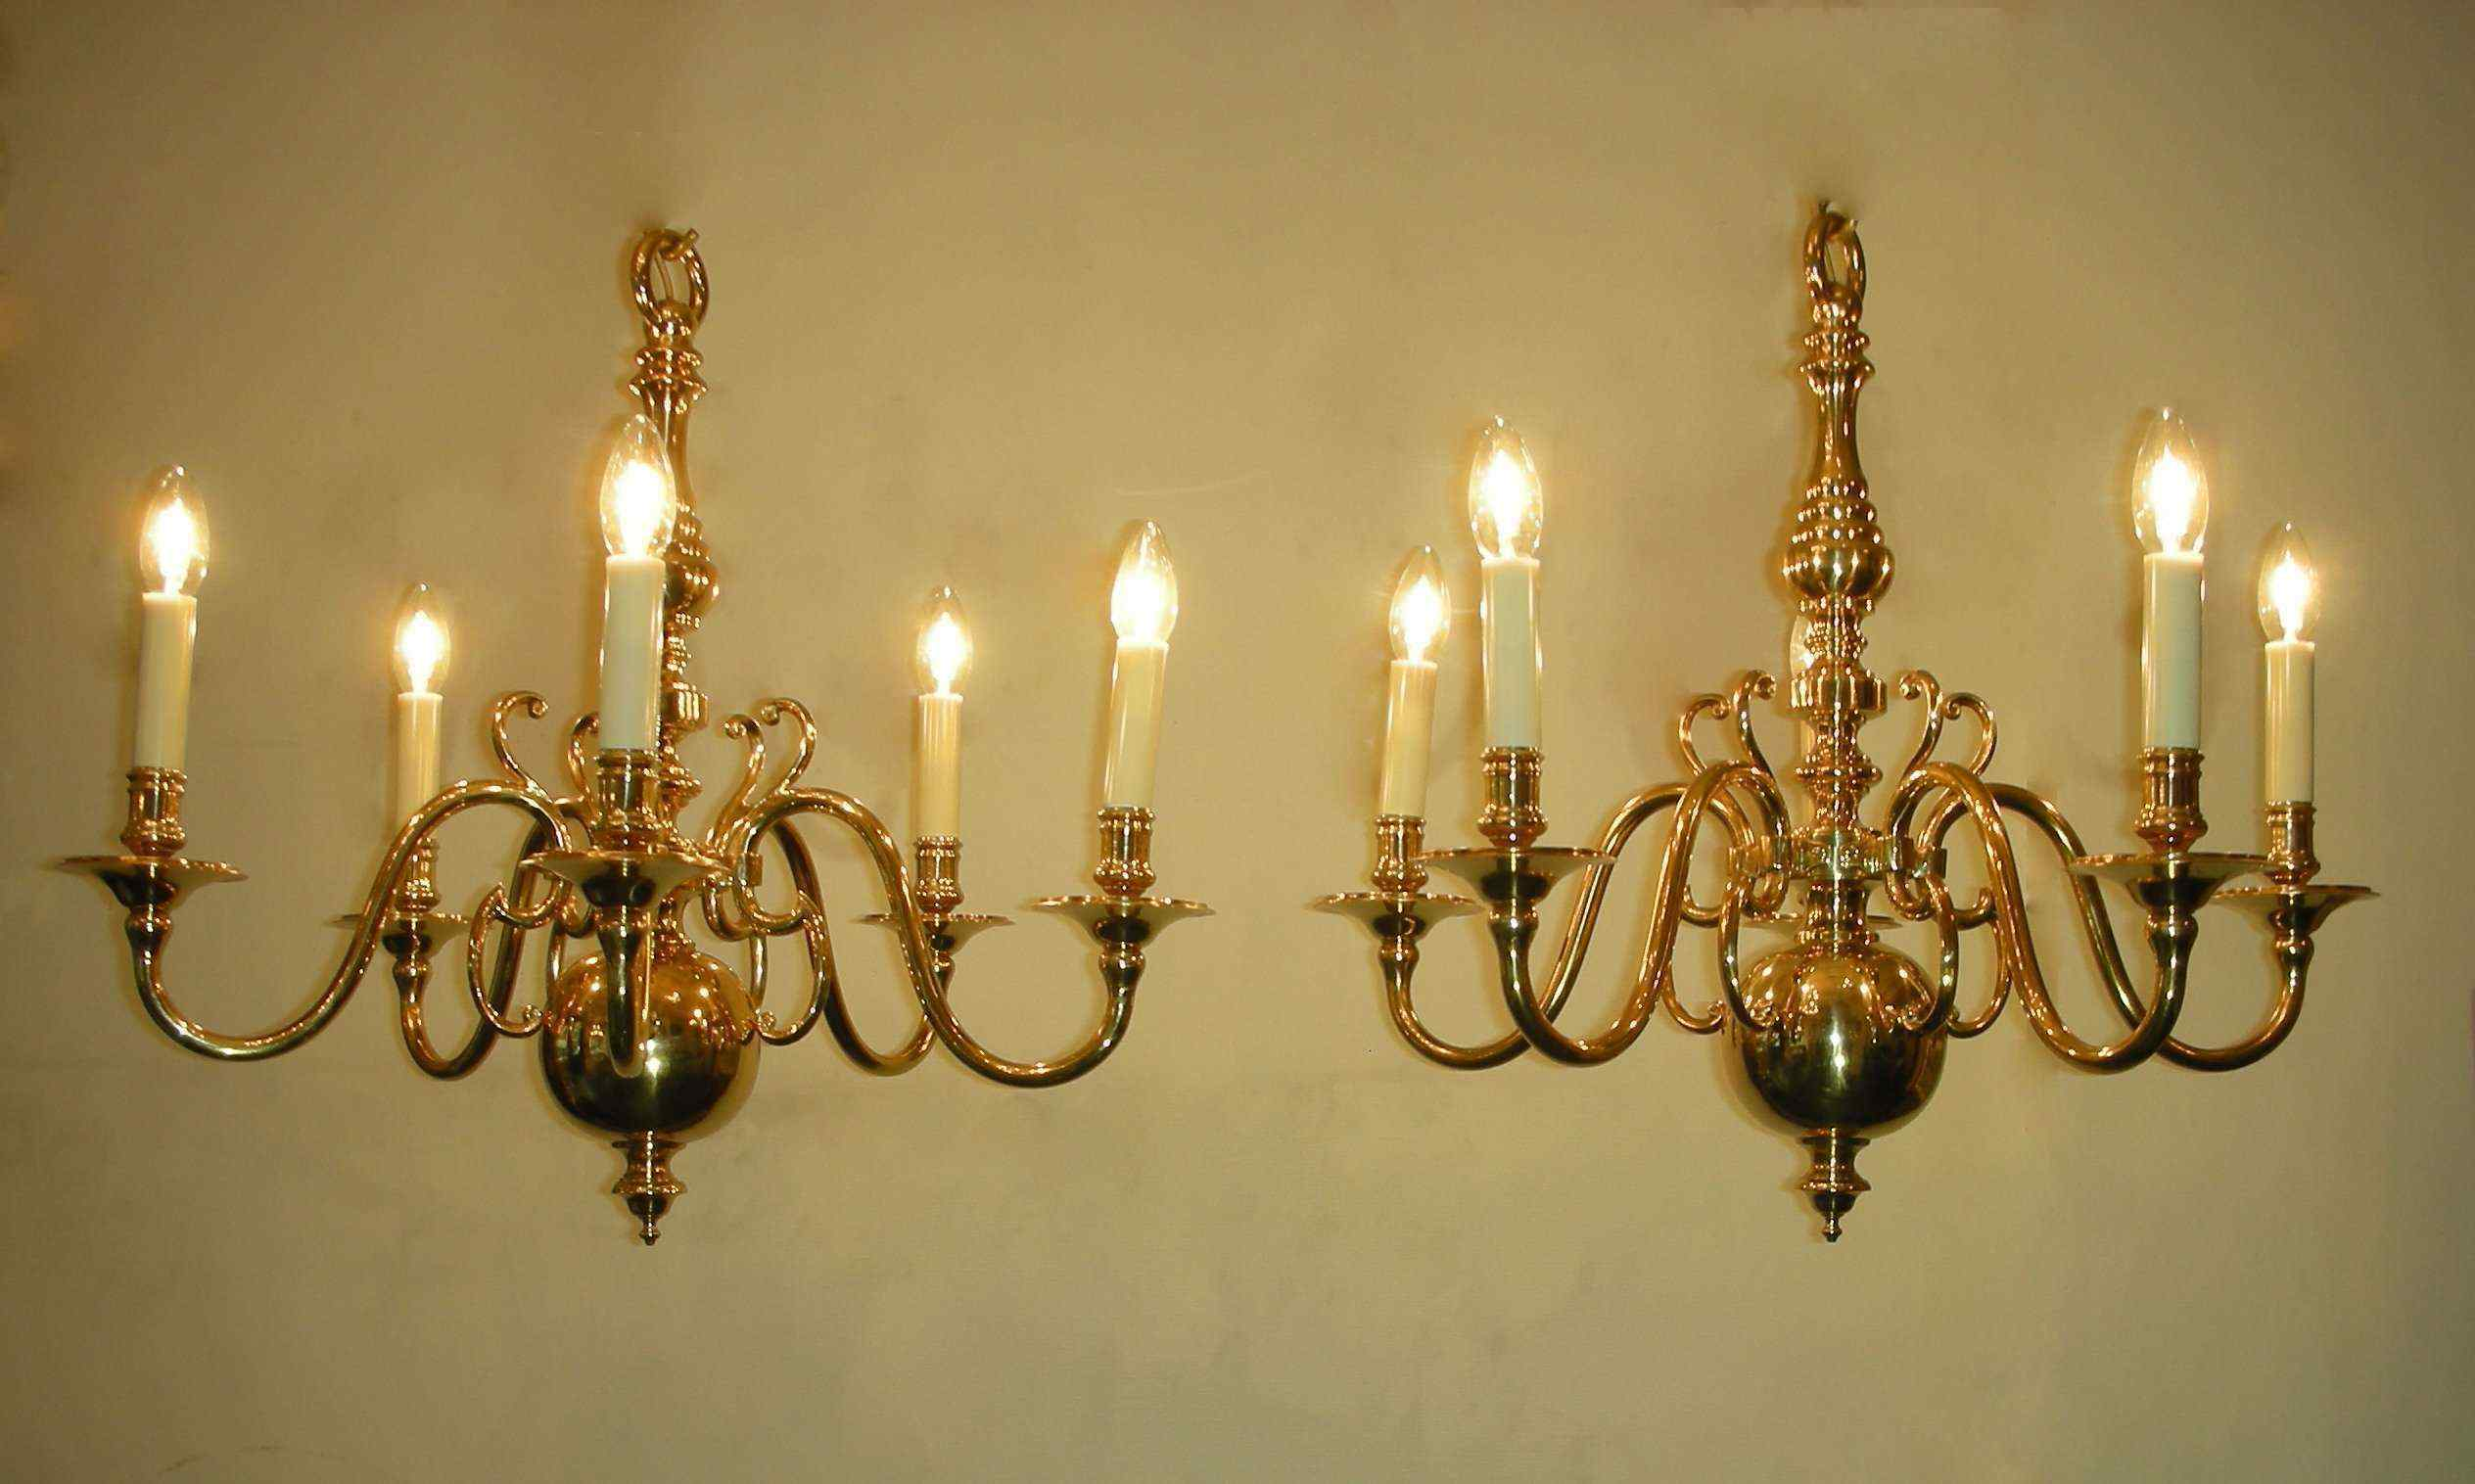 Coppia di lampadari antichi